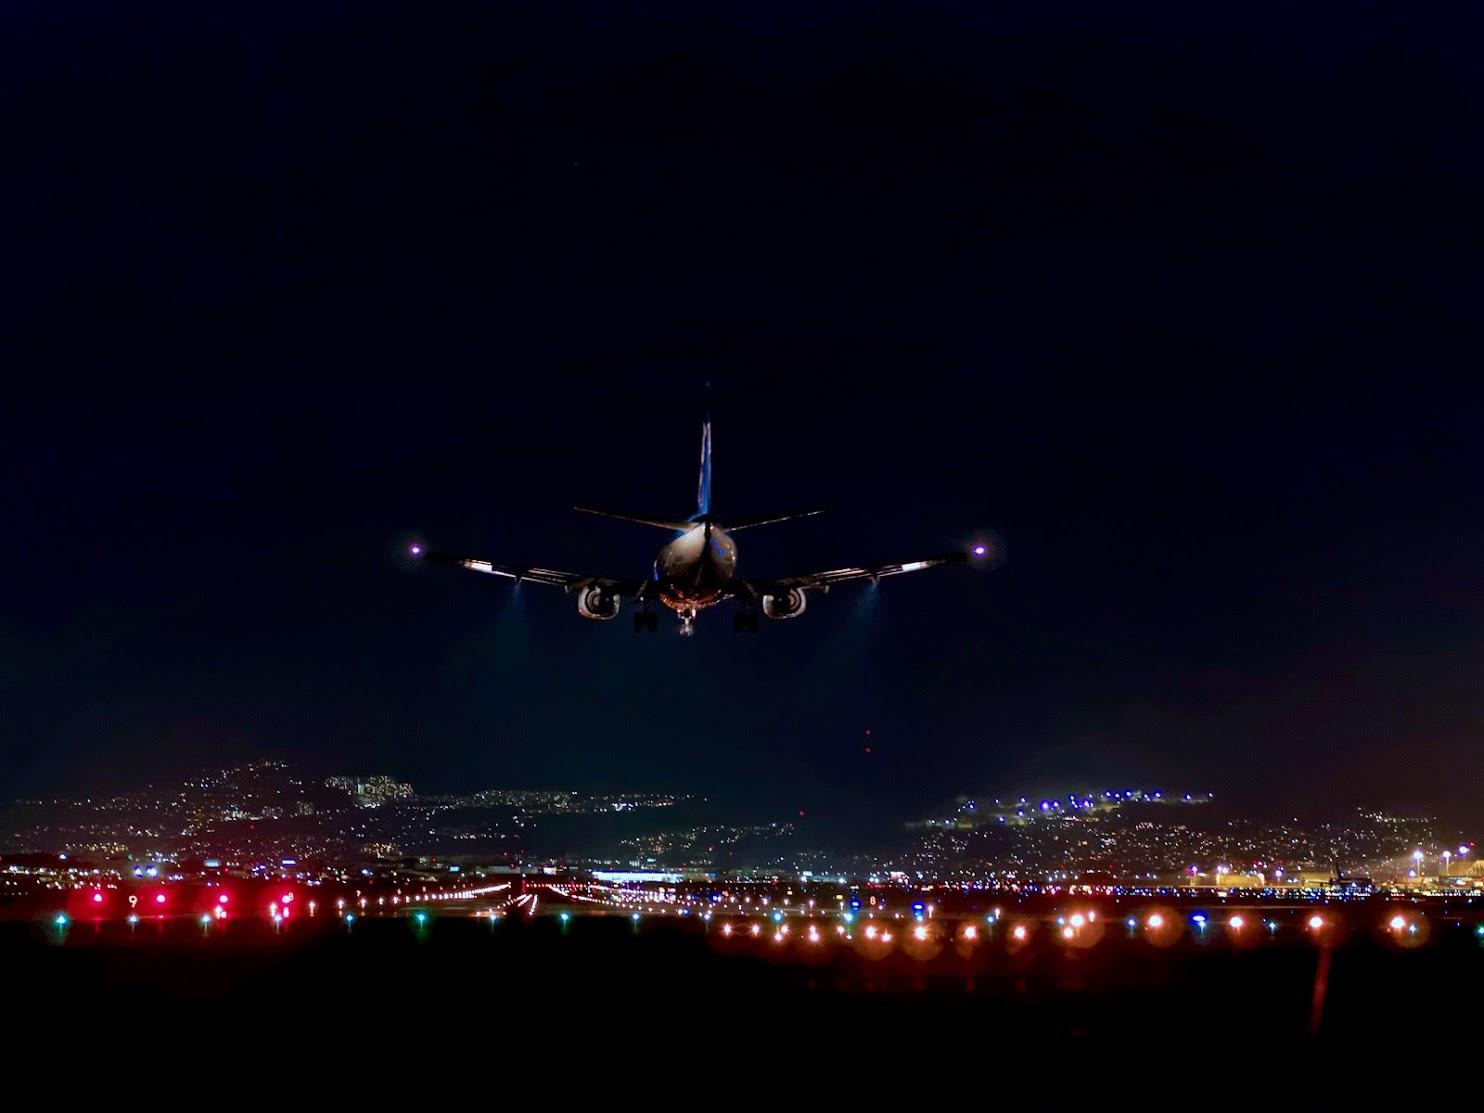 Evening Landing at Osaka (Itami) International Airport